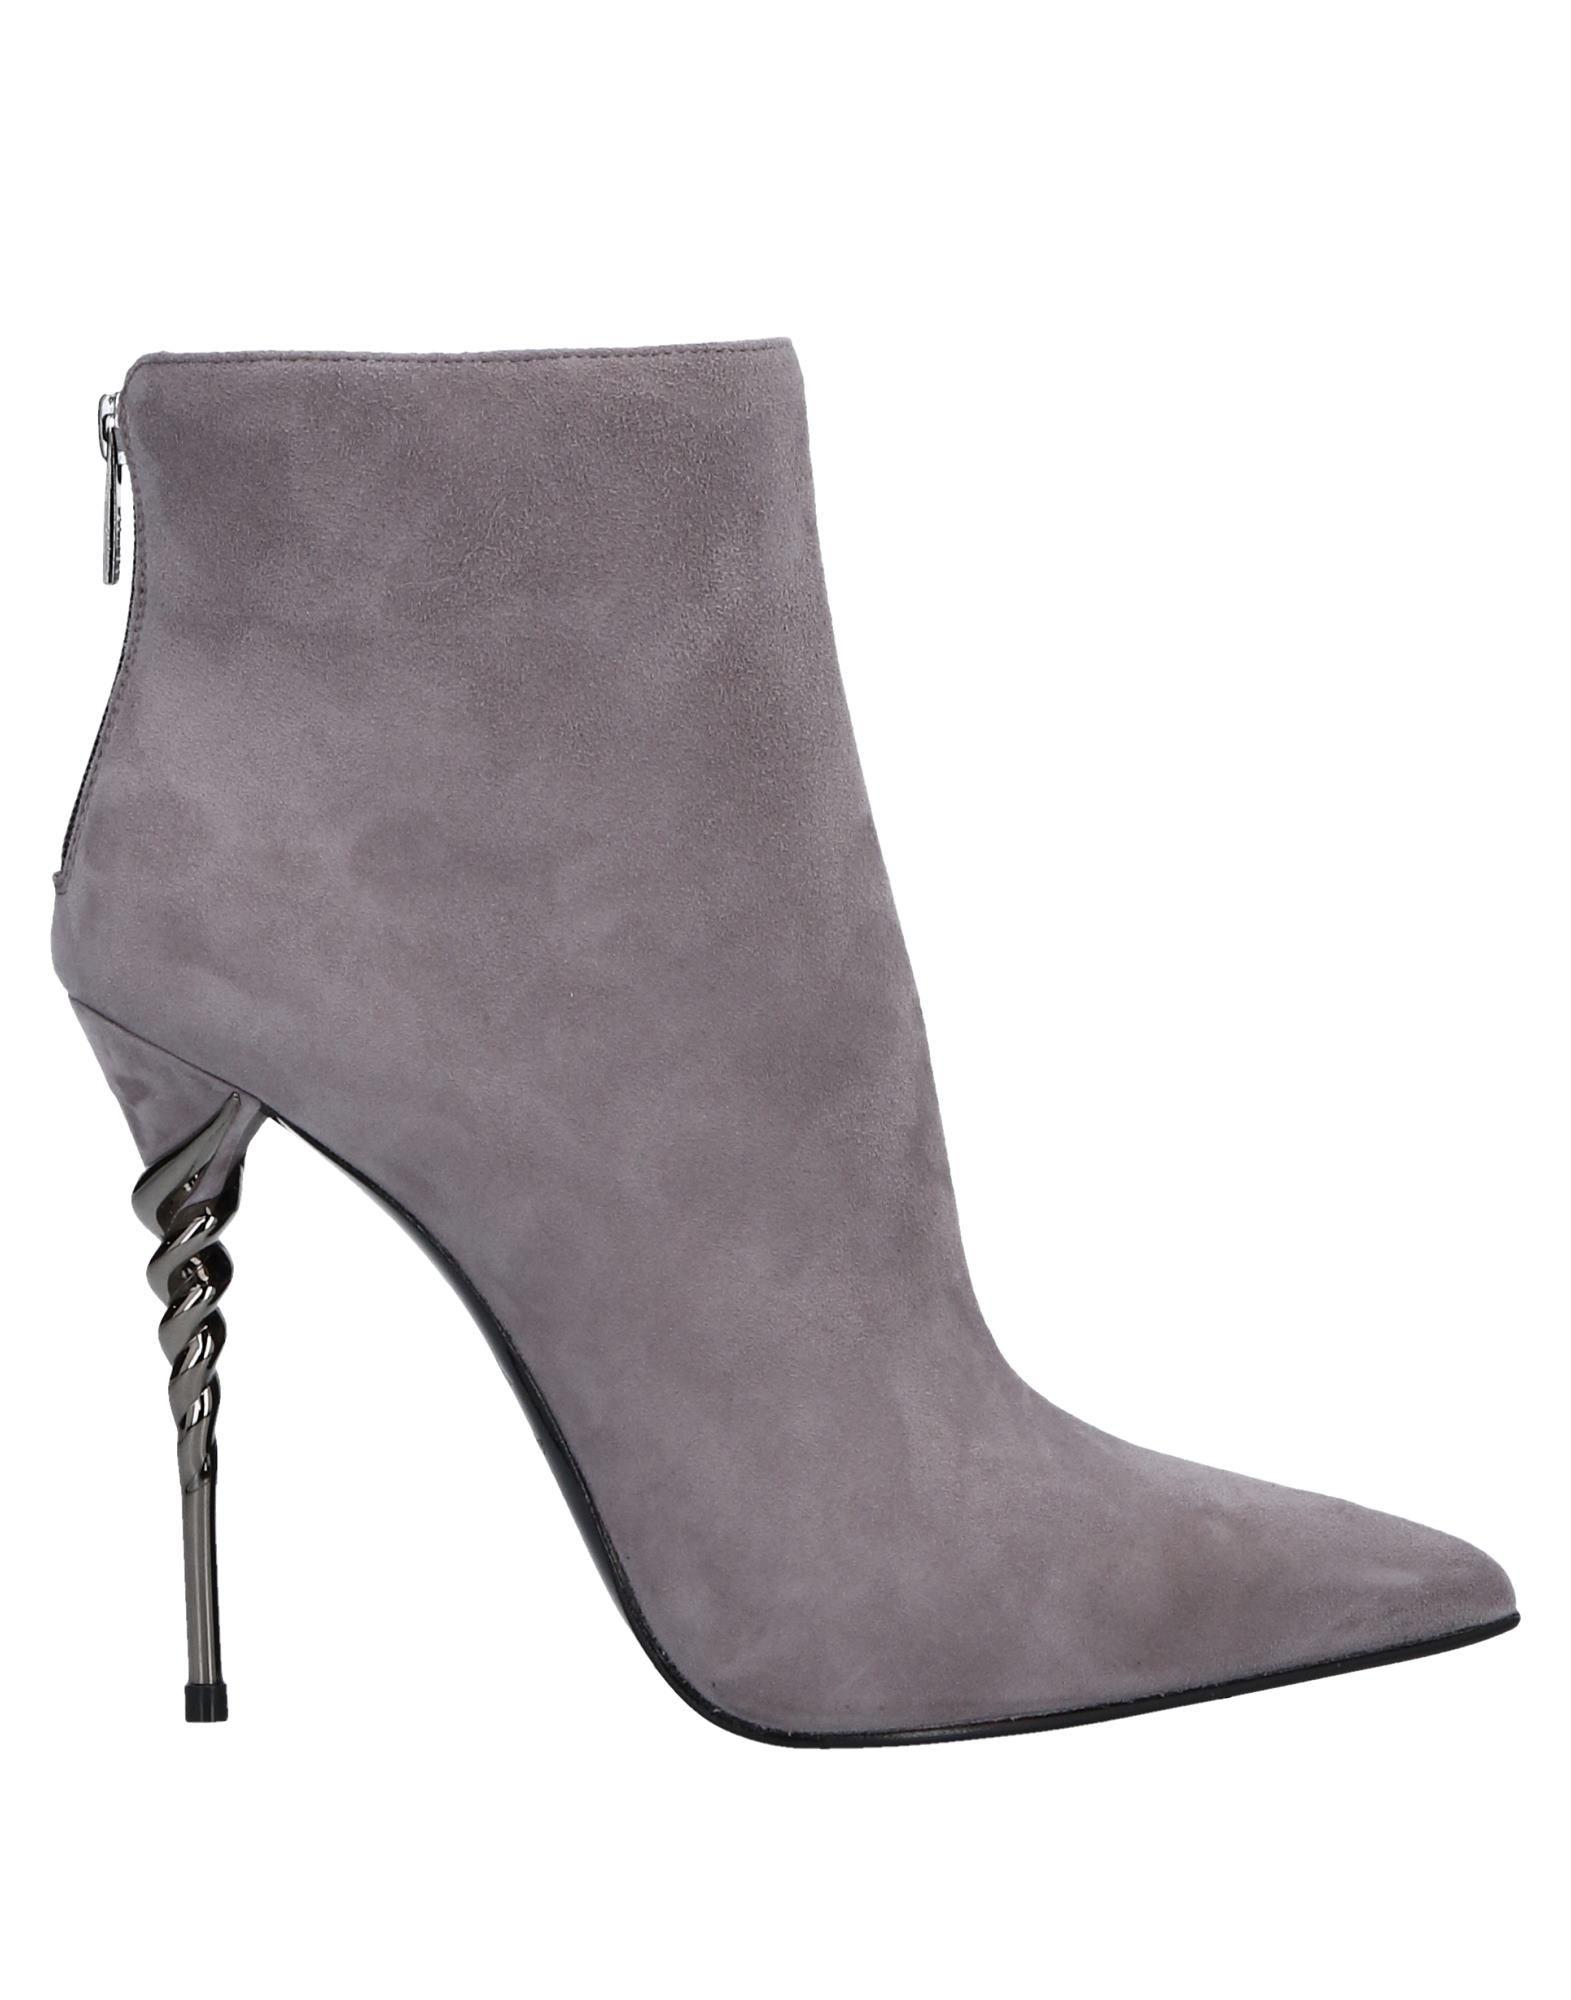 Le Silla Ankle Boot - Boots Women Le Silla Ankle Boots - online on  Australia - 11527112AP 8b8d24